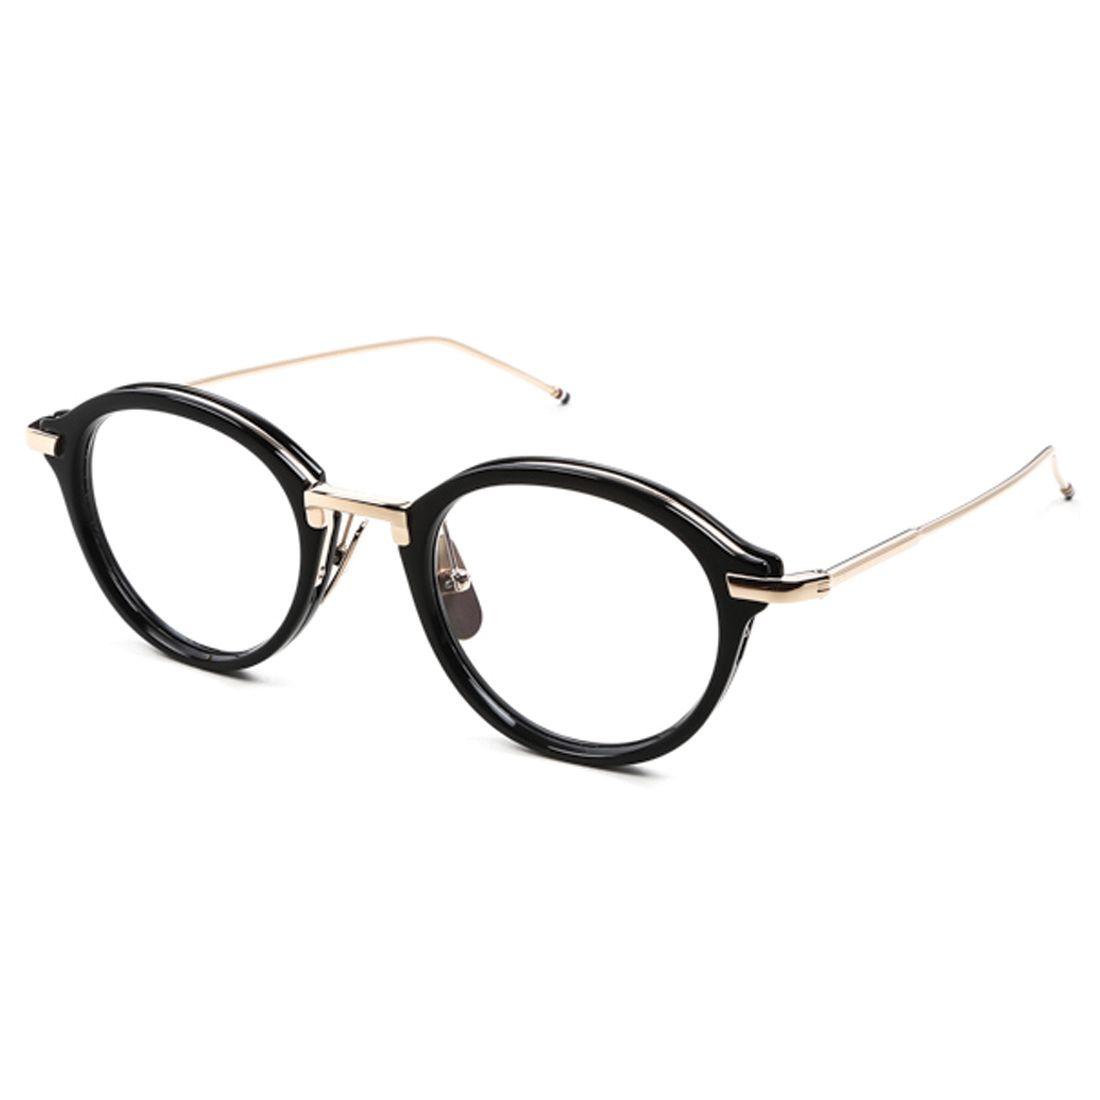 Thom Browne | Eyewear | Black Acetate & 14K Gold Optical Glasses